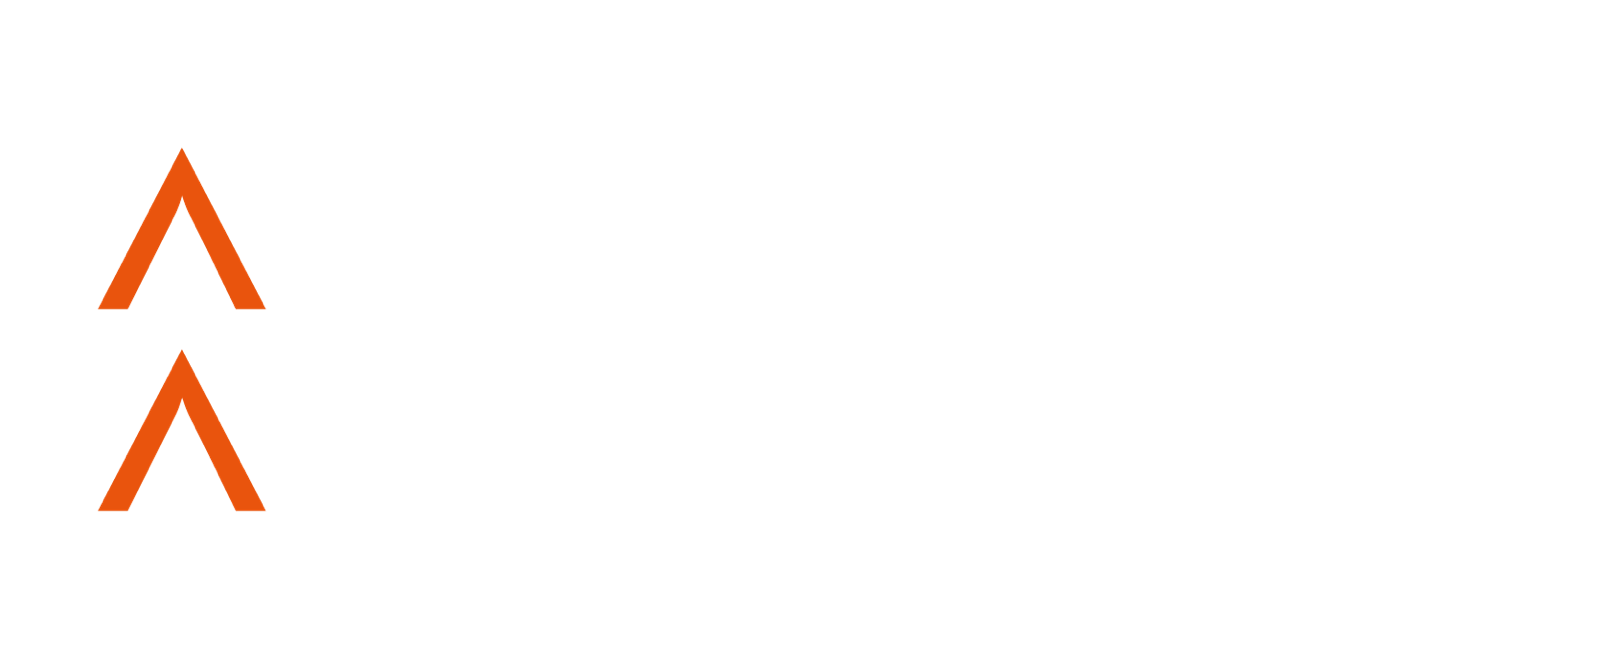 Andrews Associates